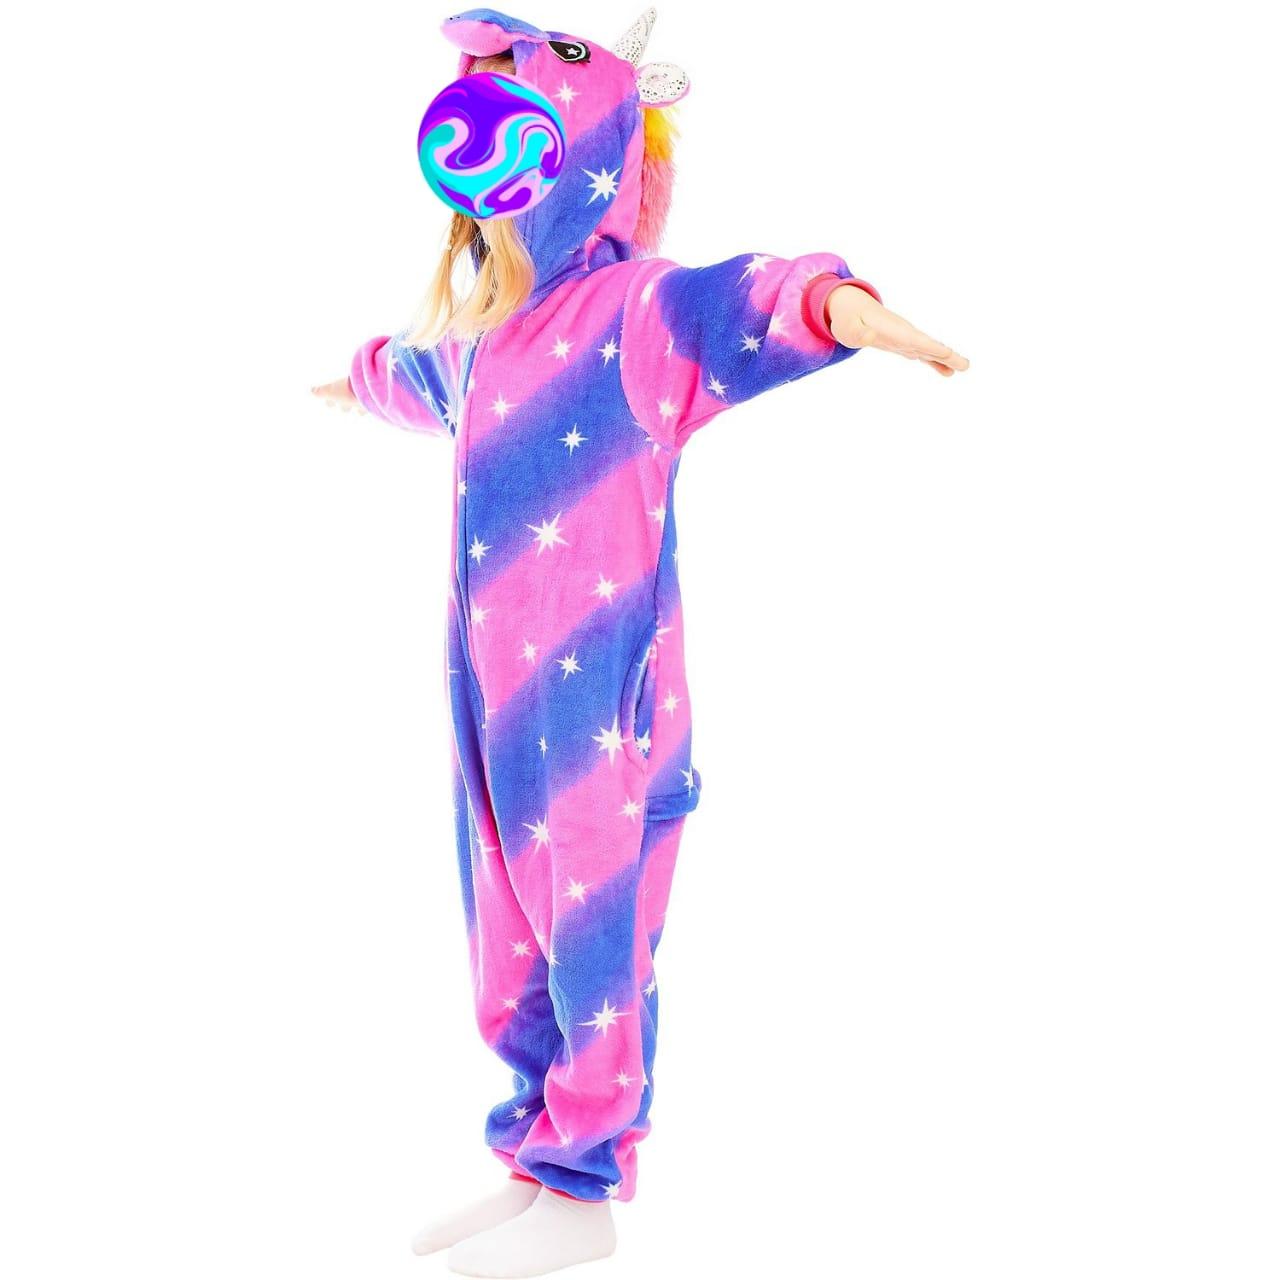 Детский кигуруми Единорог, цвет: фиолетовый, артикул: KIG-4